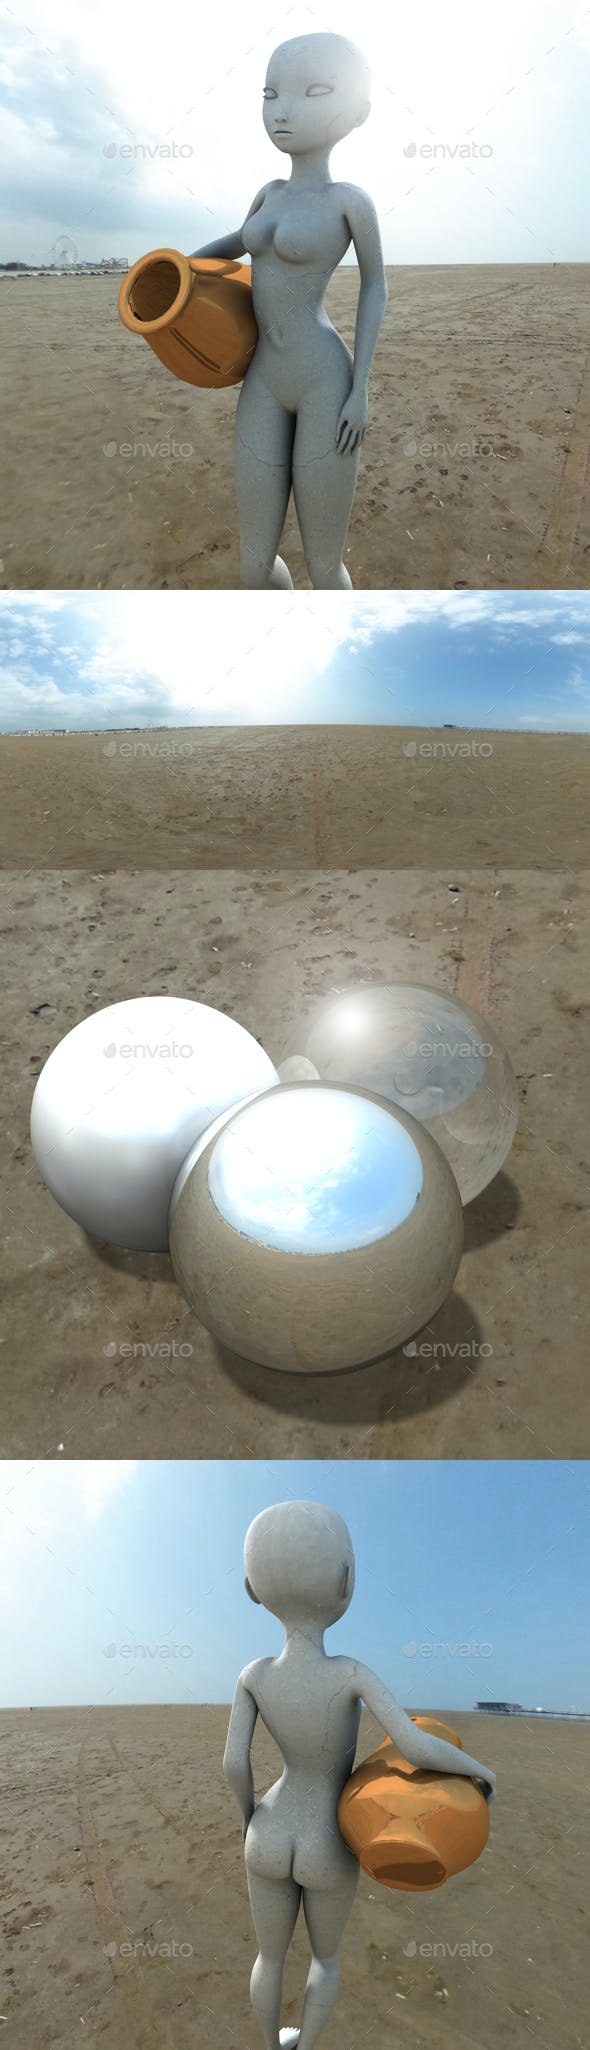 Cloudy Bright Beach HDRI - 3DOcean Item for Sale